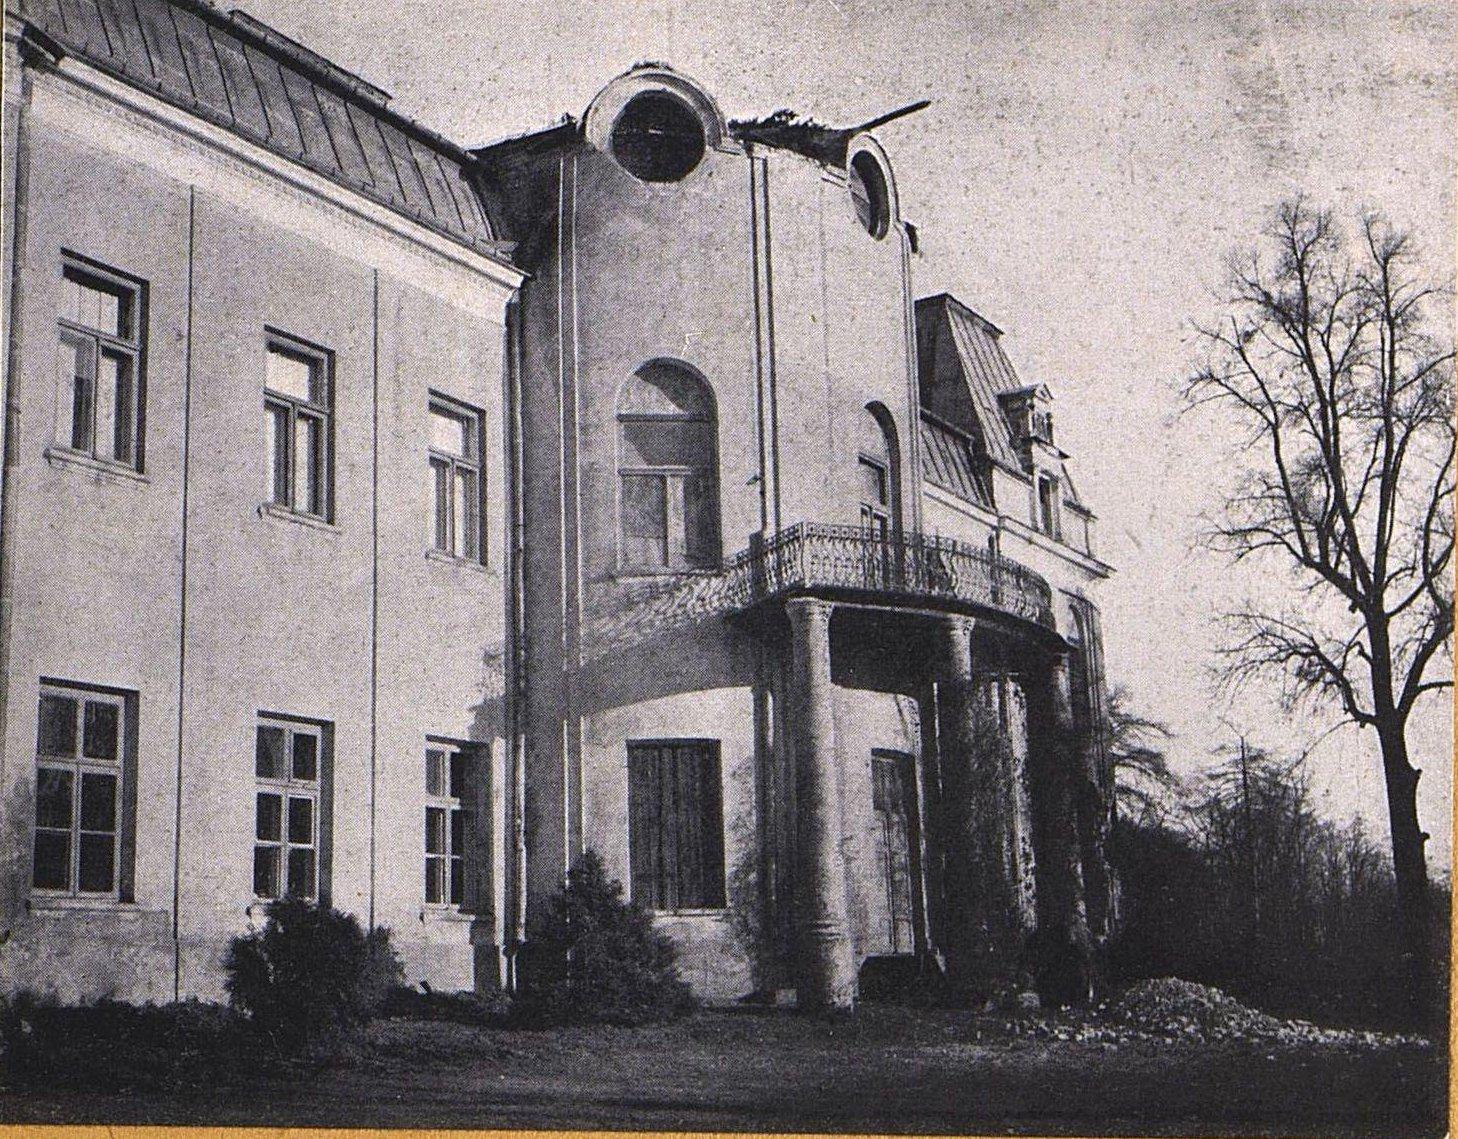 23. Вид части дворца Густава Блавдзевича в Новом-Месте